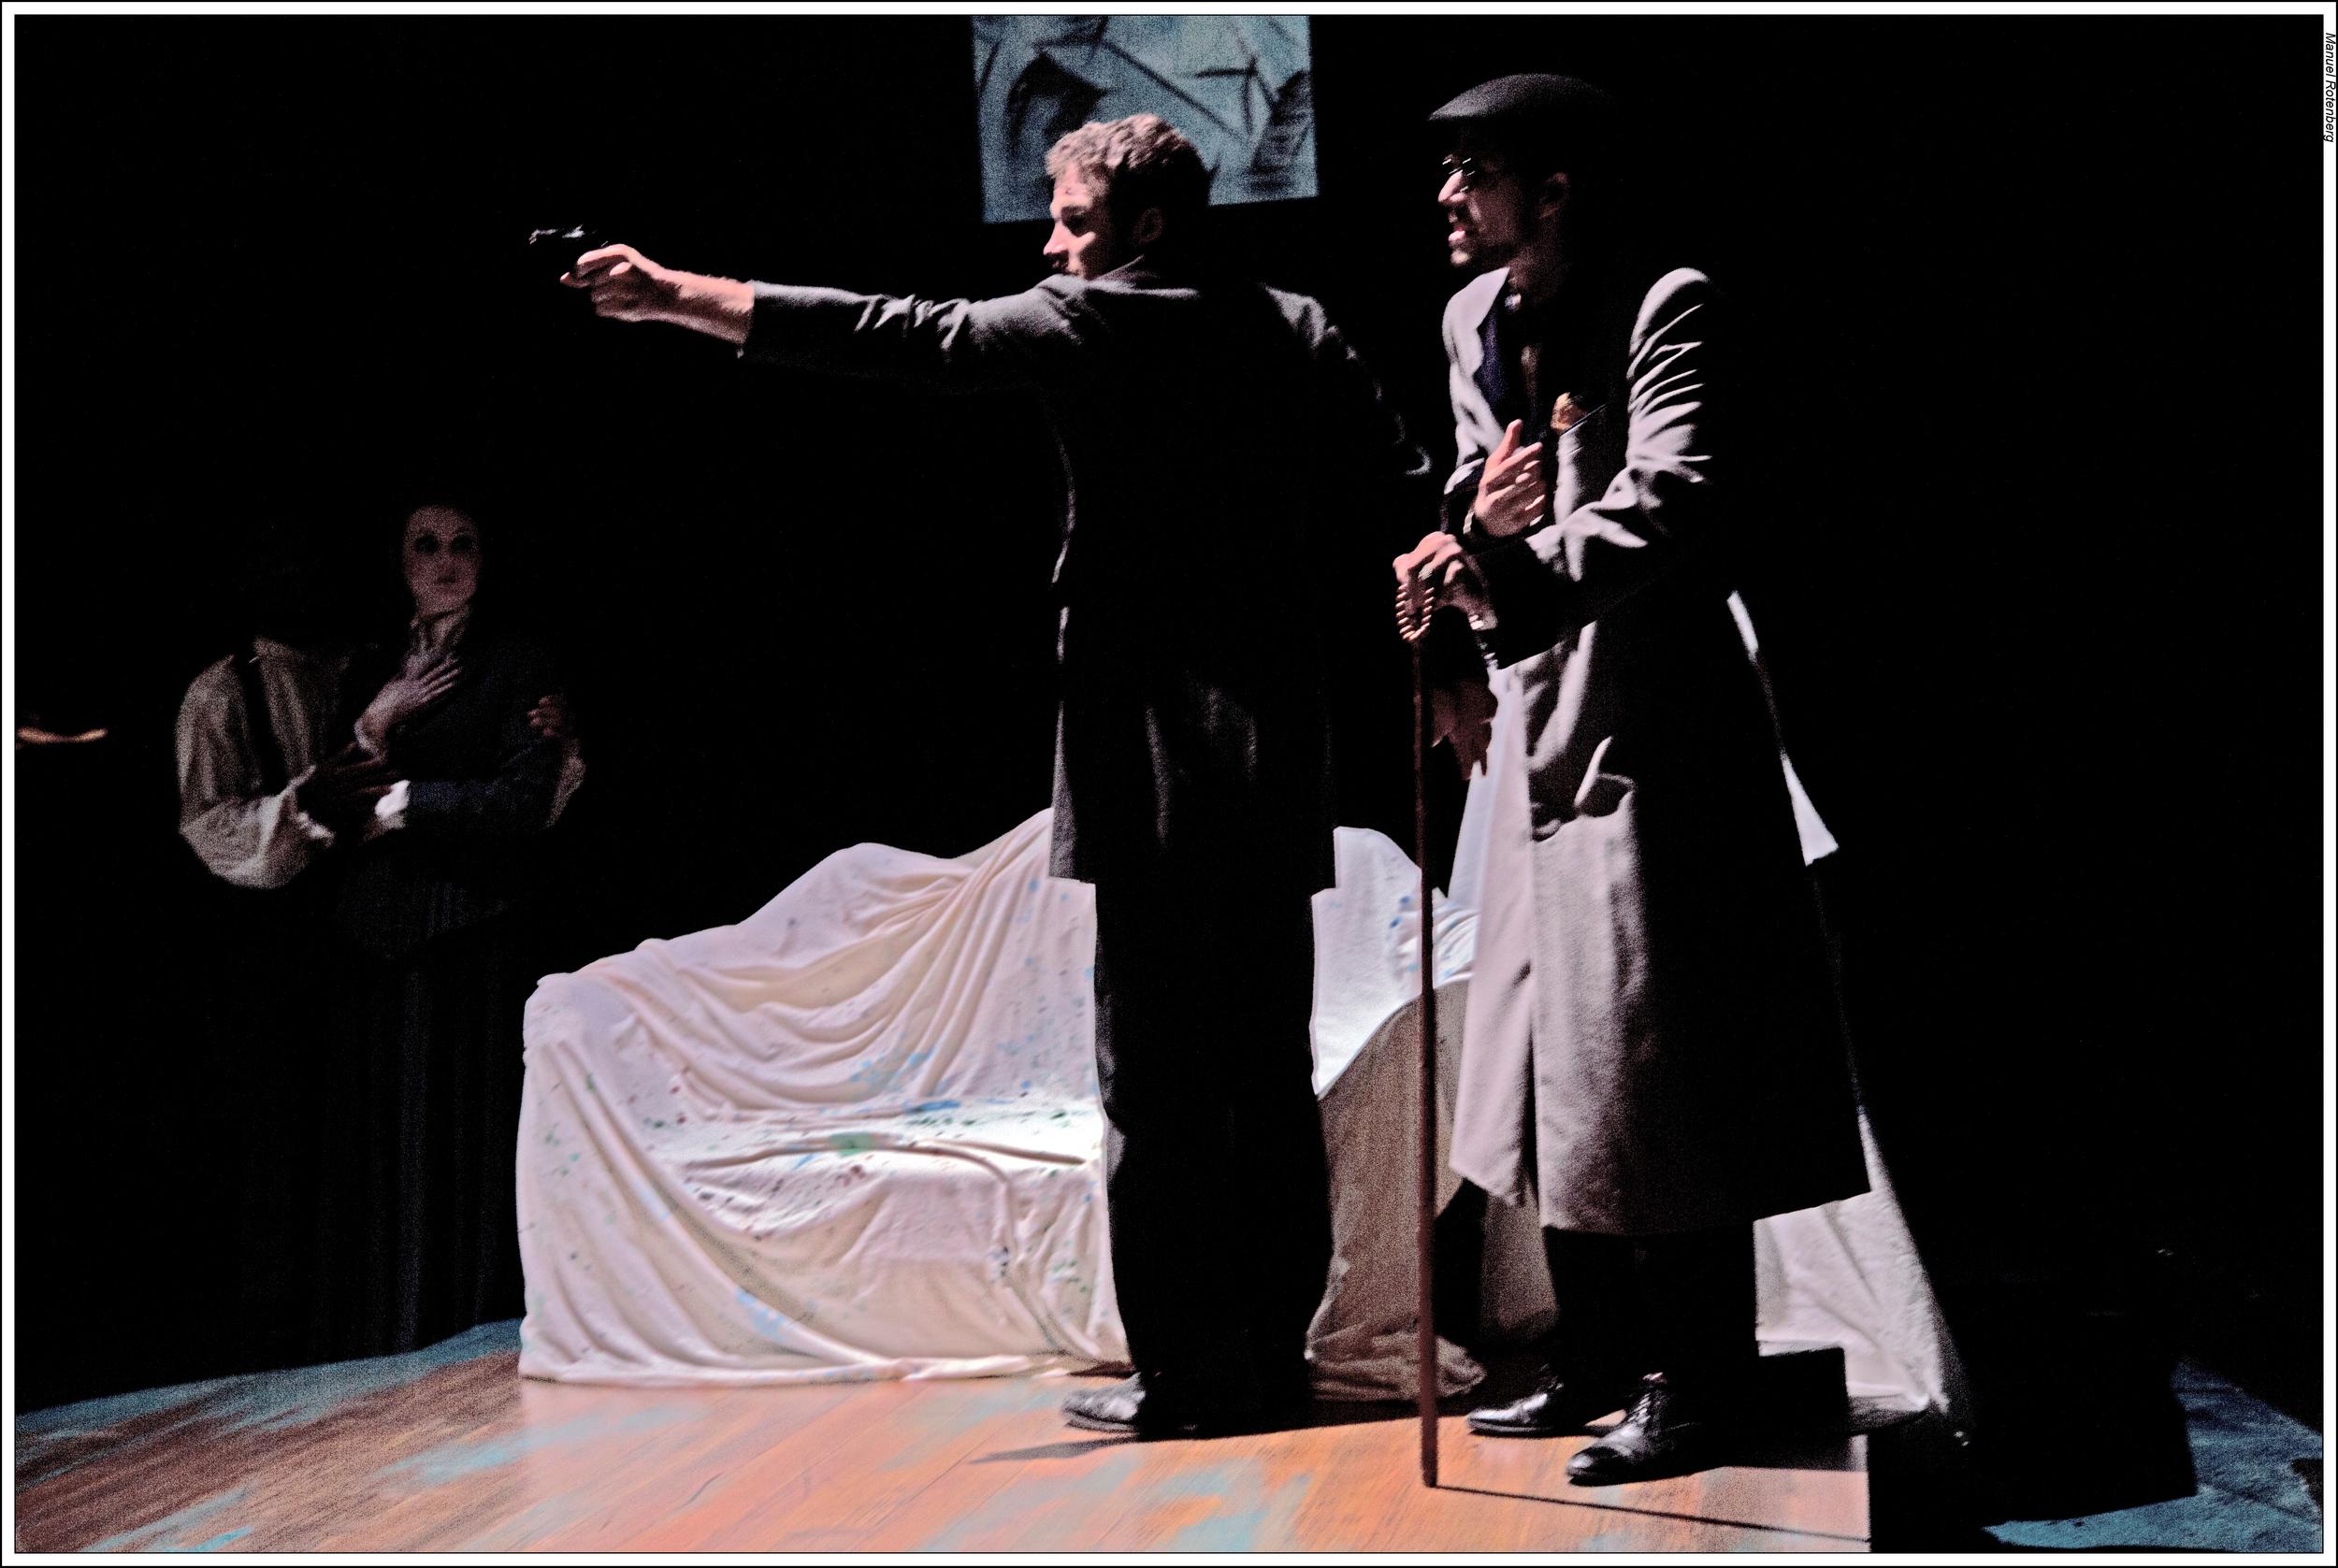 Casagemas (Michael Hammond) shoots Germaine and then himself.